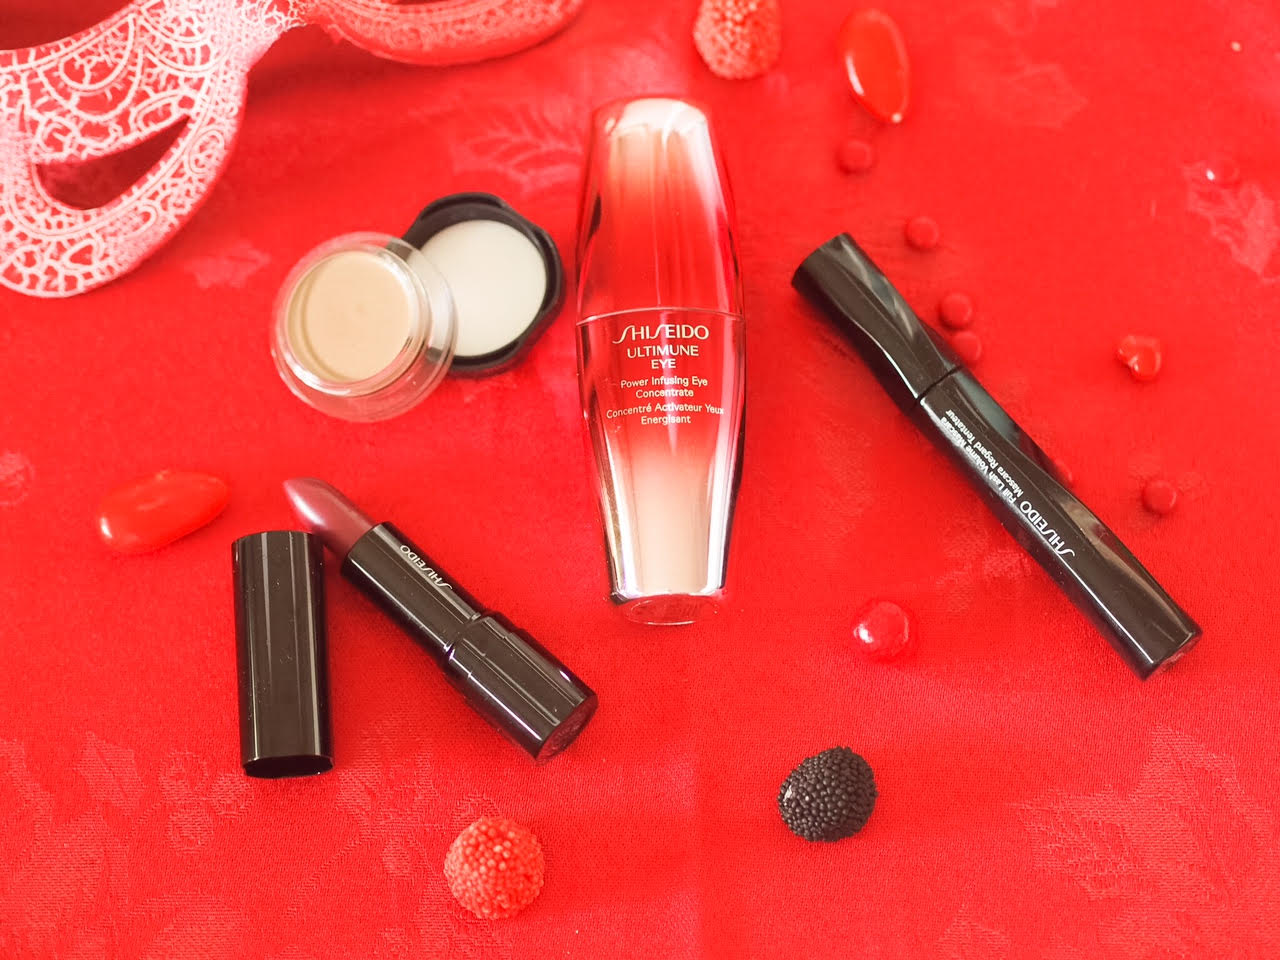 Shiseido Ultimune eye power infusing